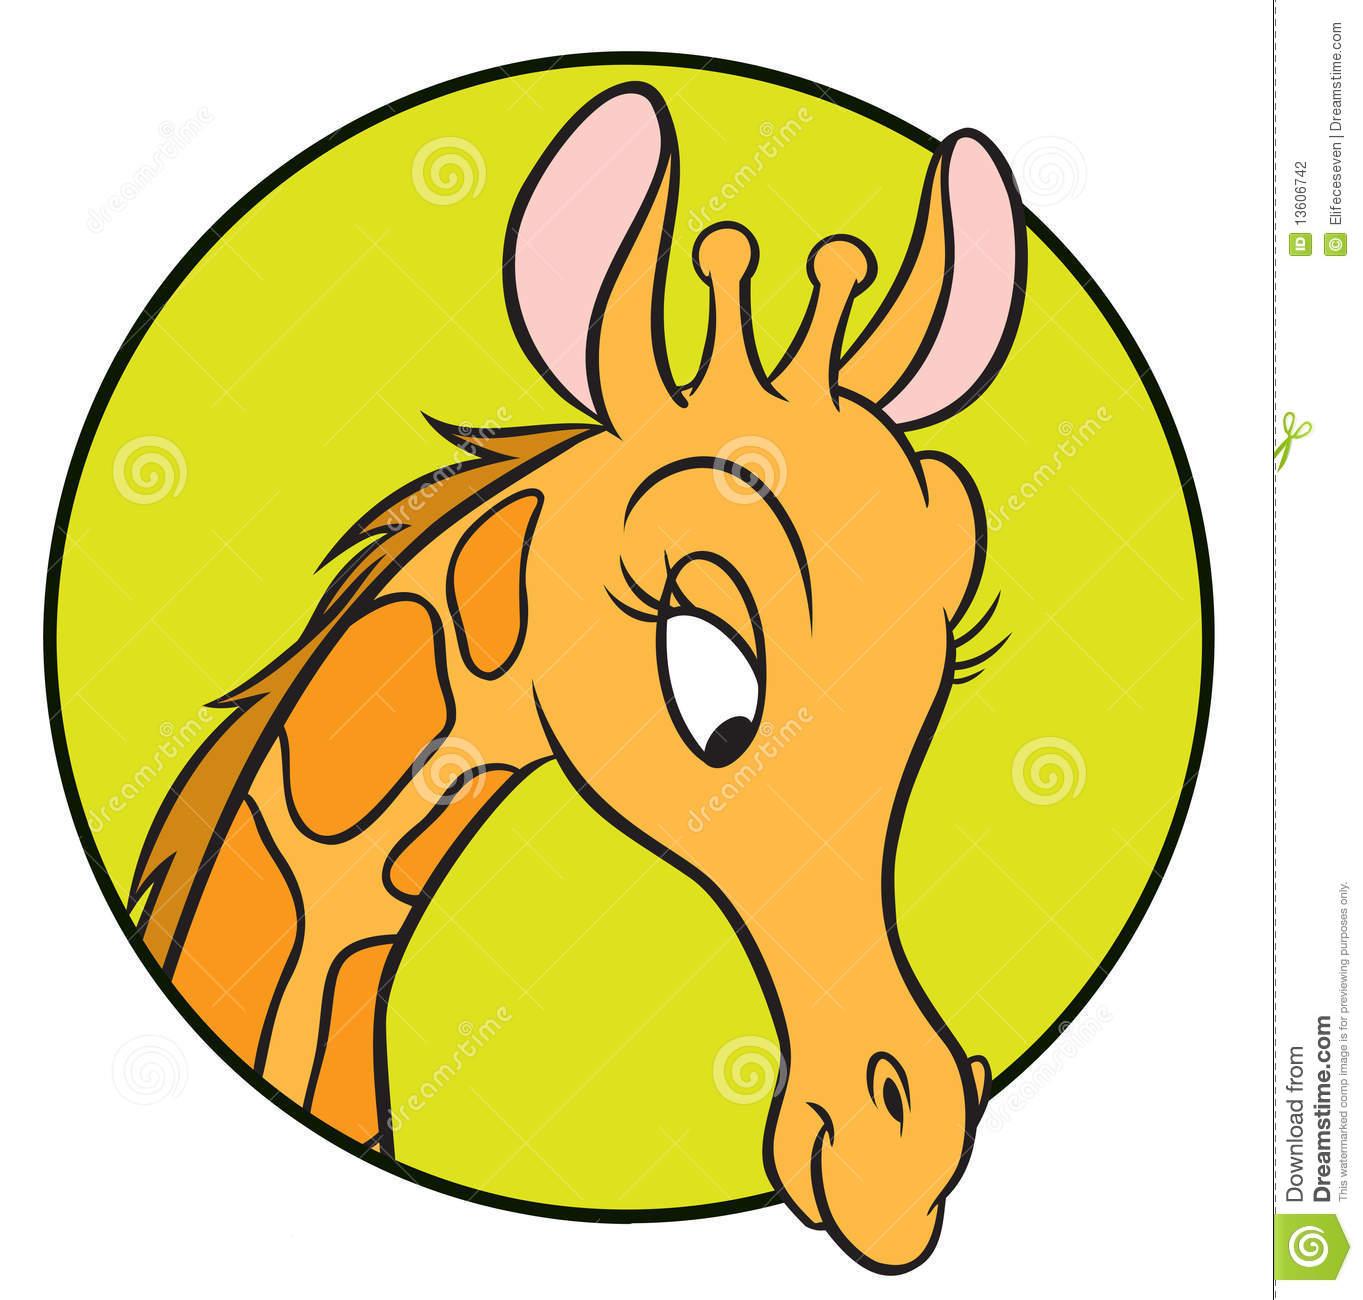 1363x1300 Giraffe Clipart Simple Cartoon